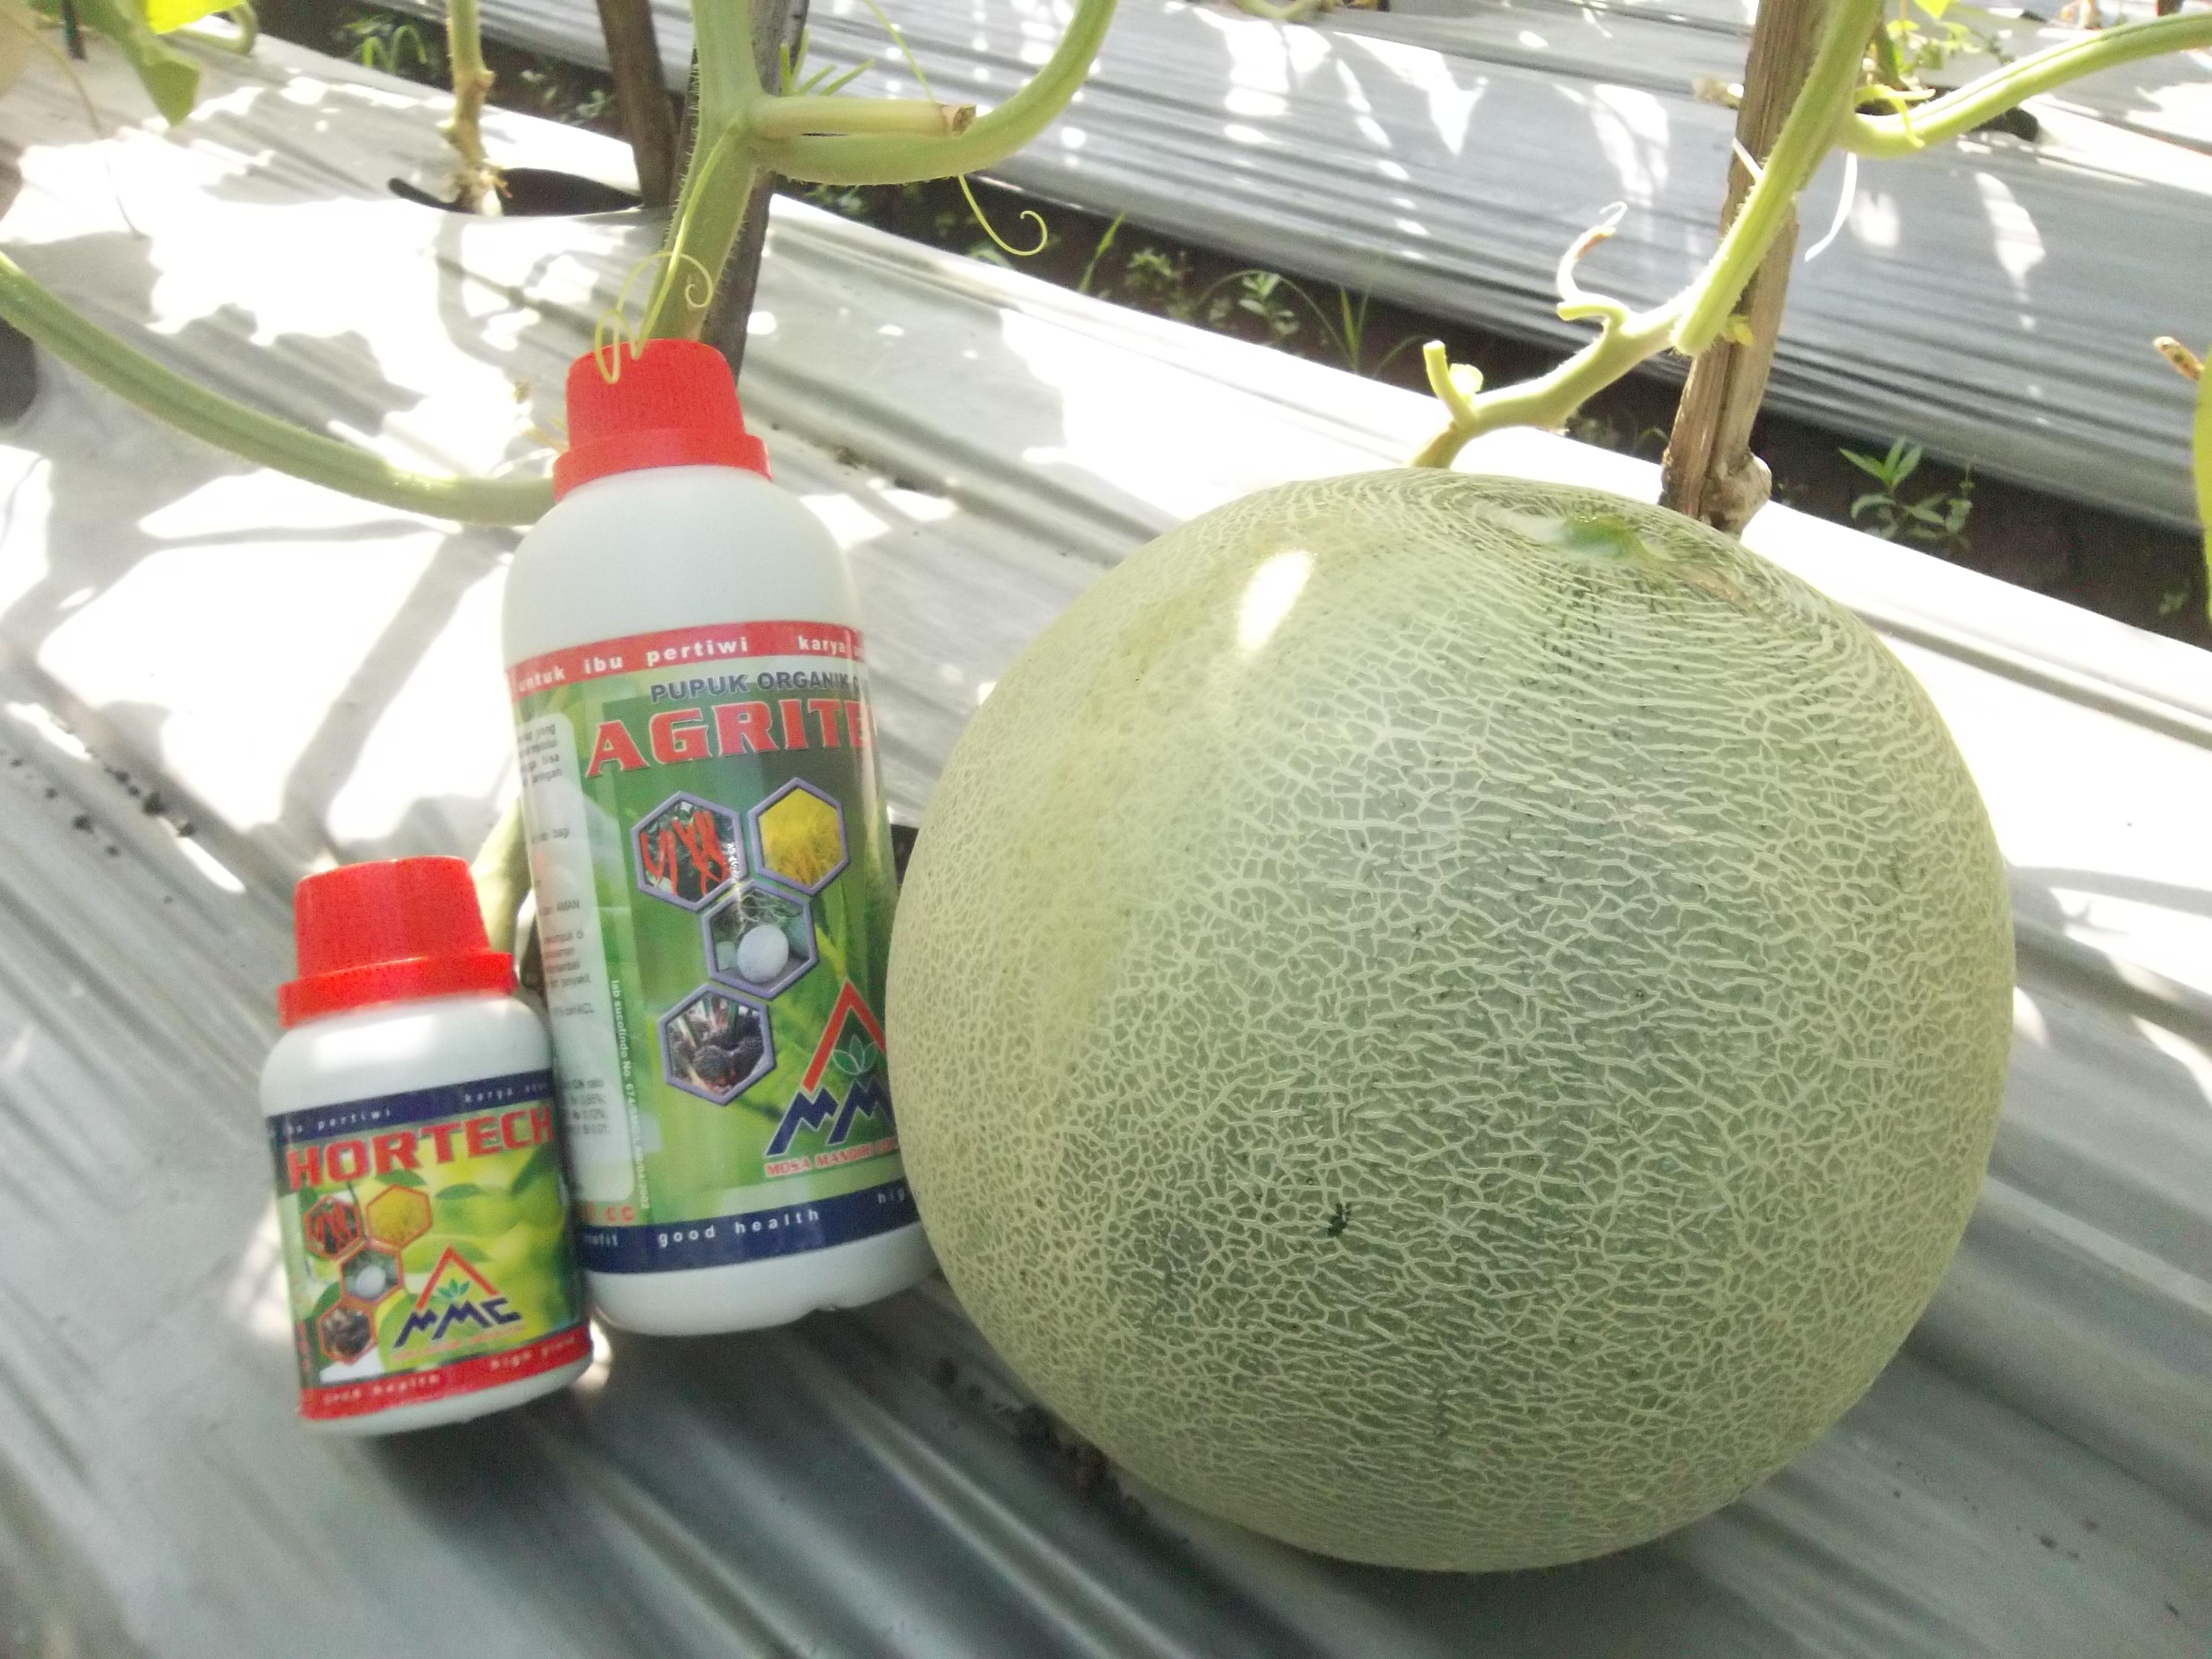 100_1273 agritech dan hortech untuk melon